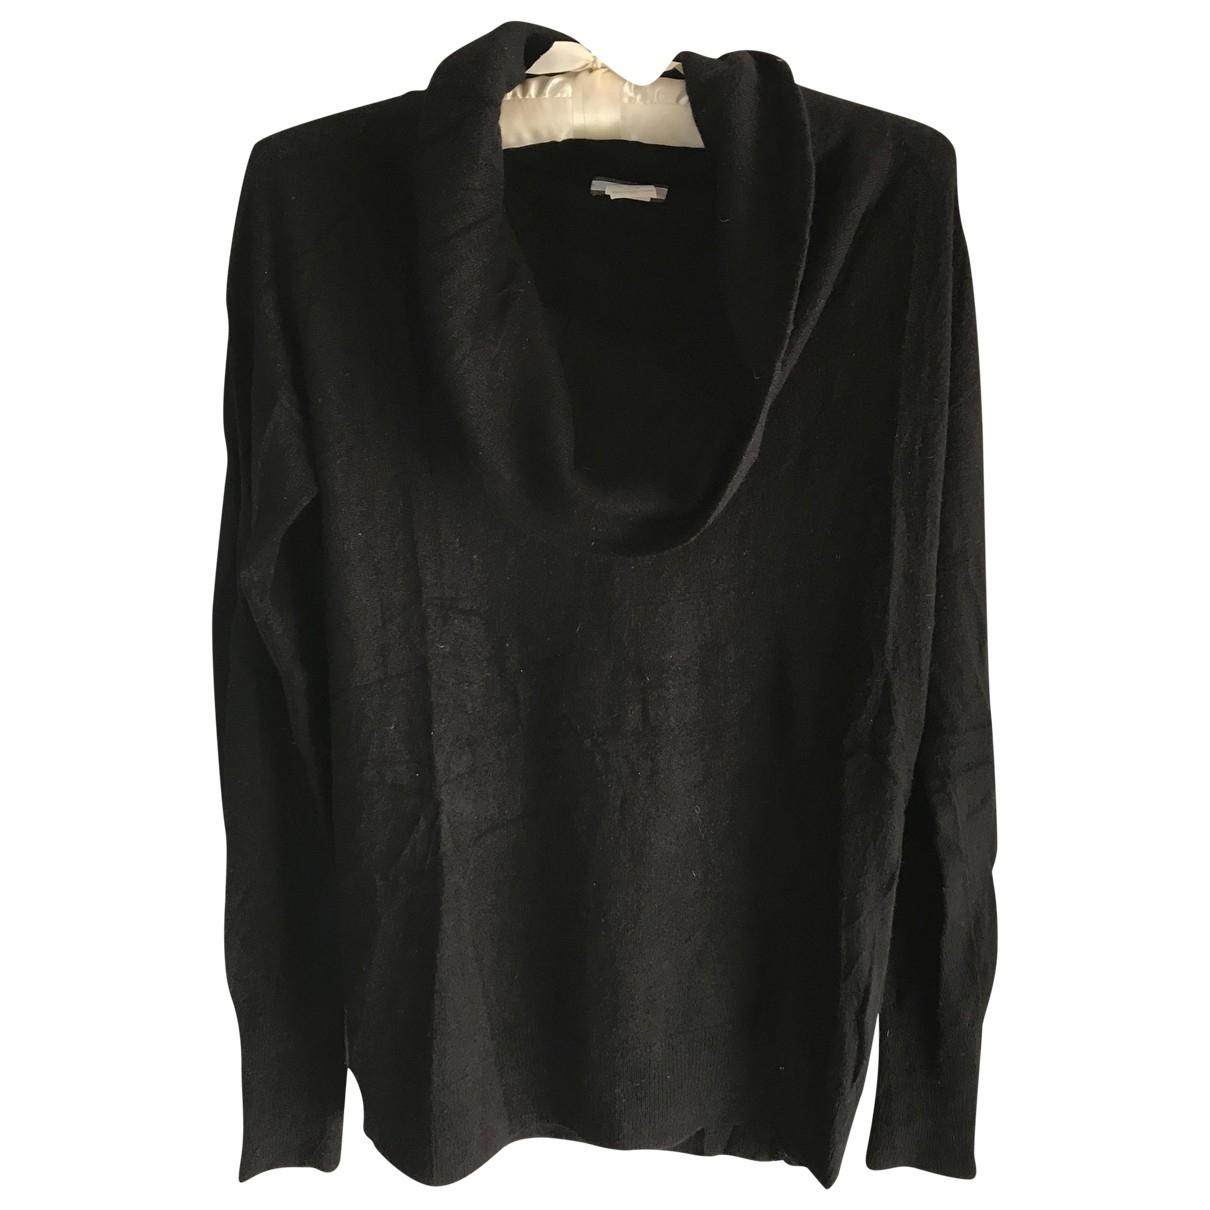 J.crew N Black Cashmere Knitwear for Women M International